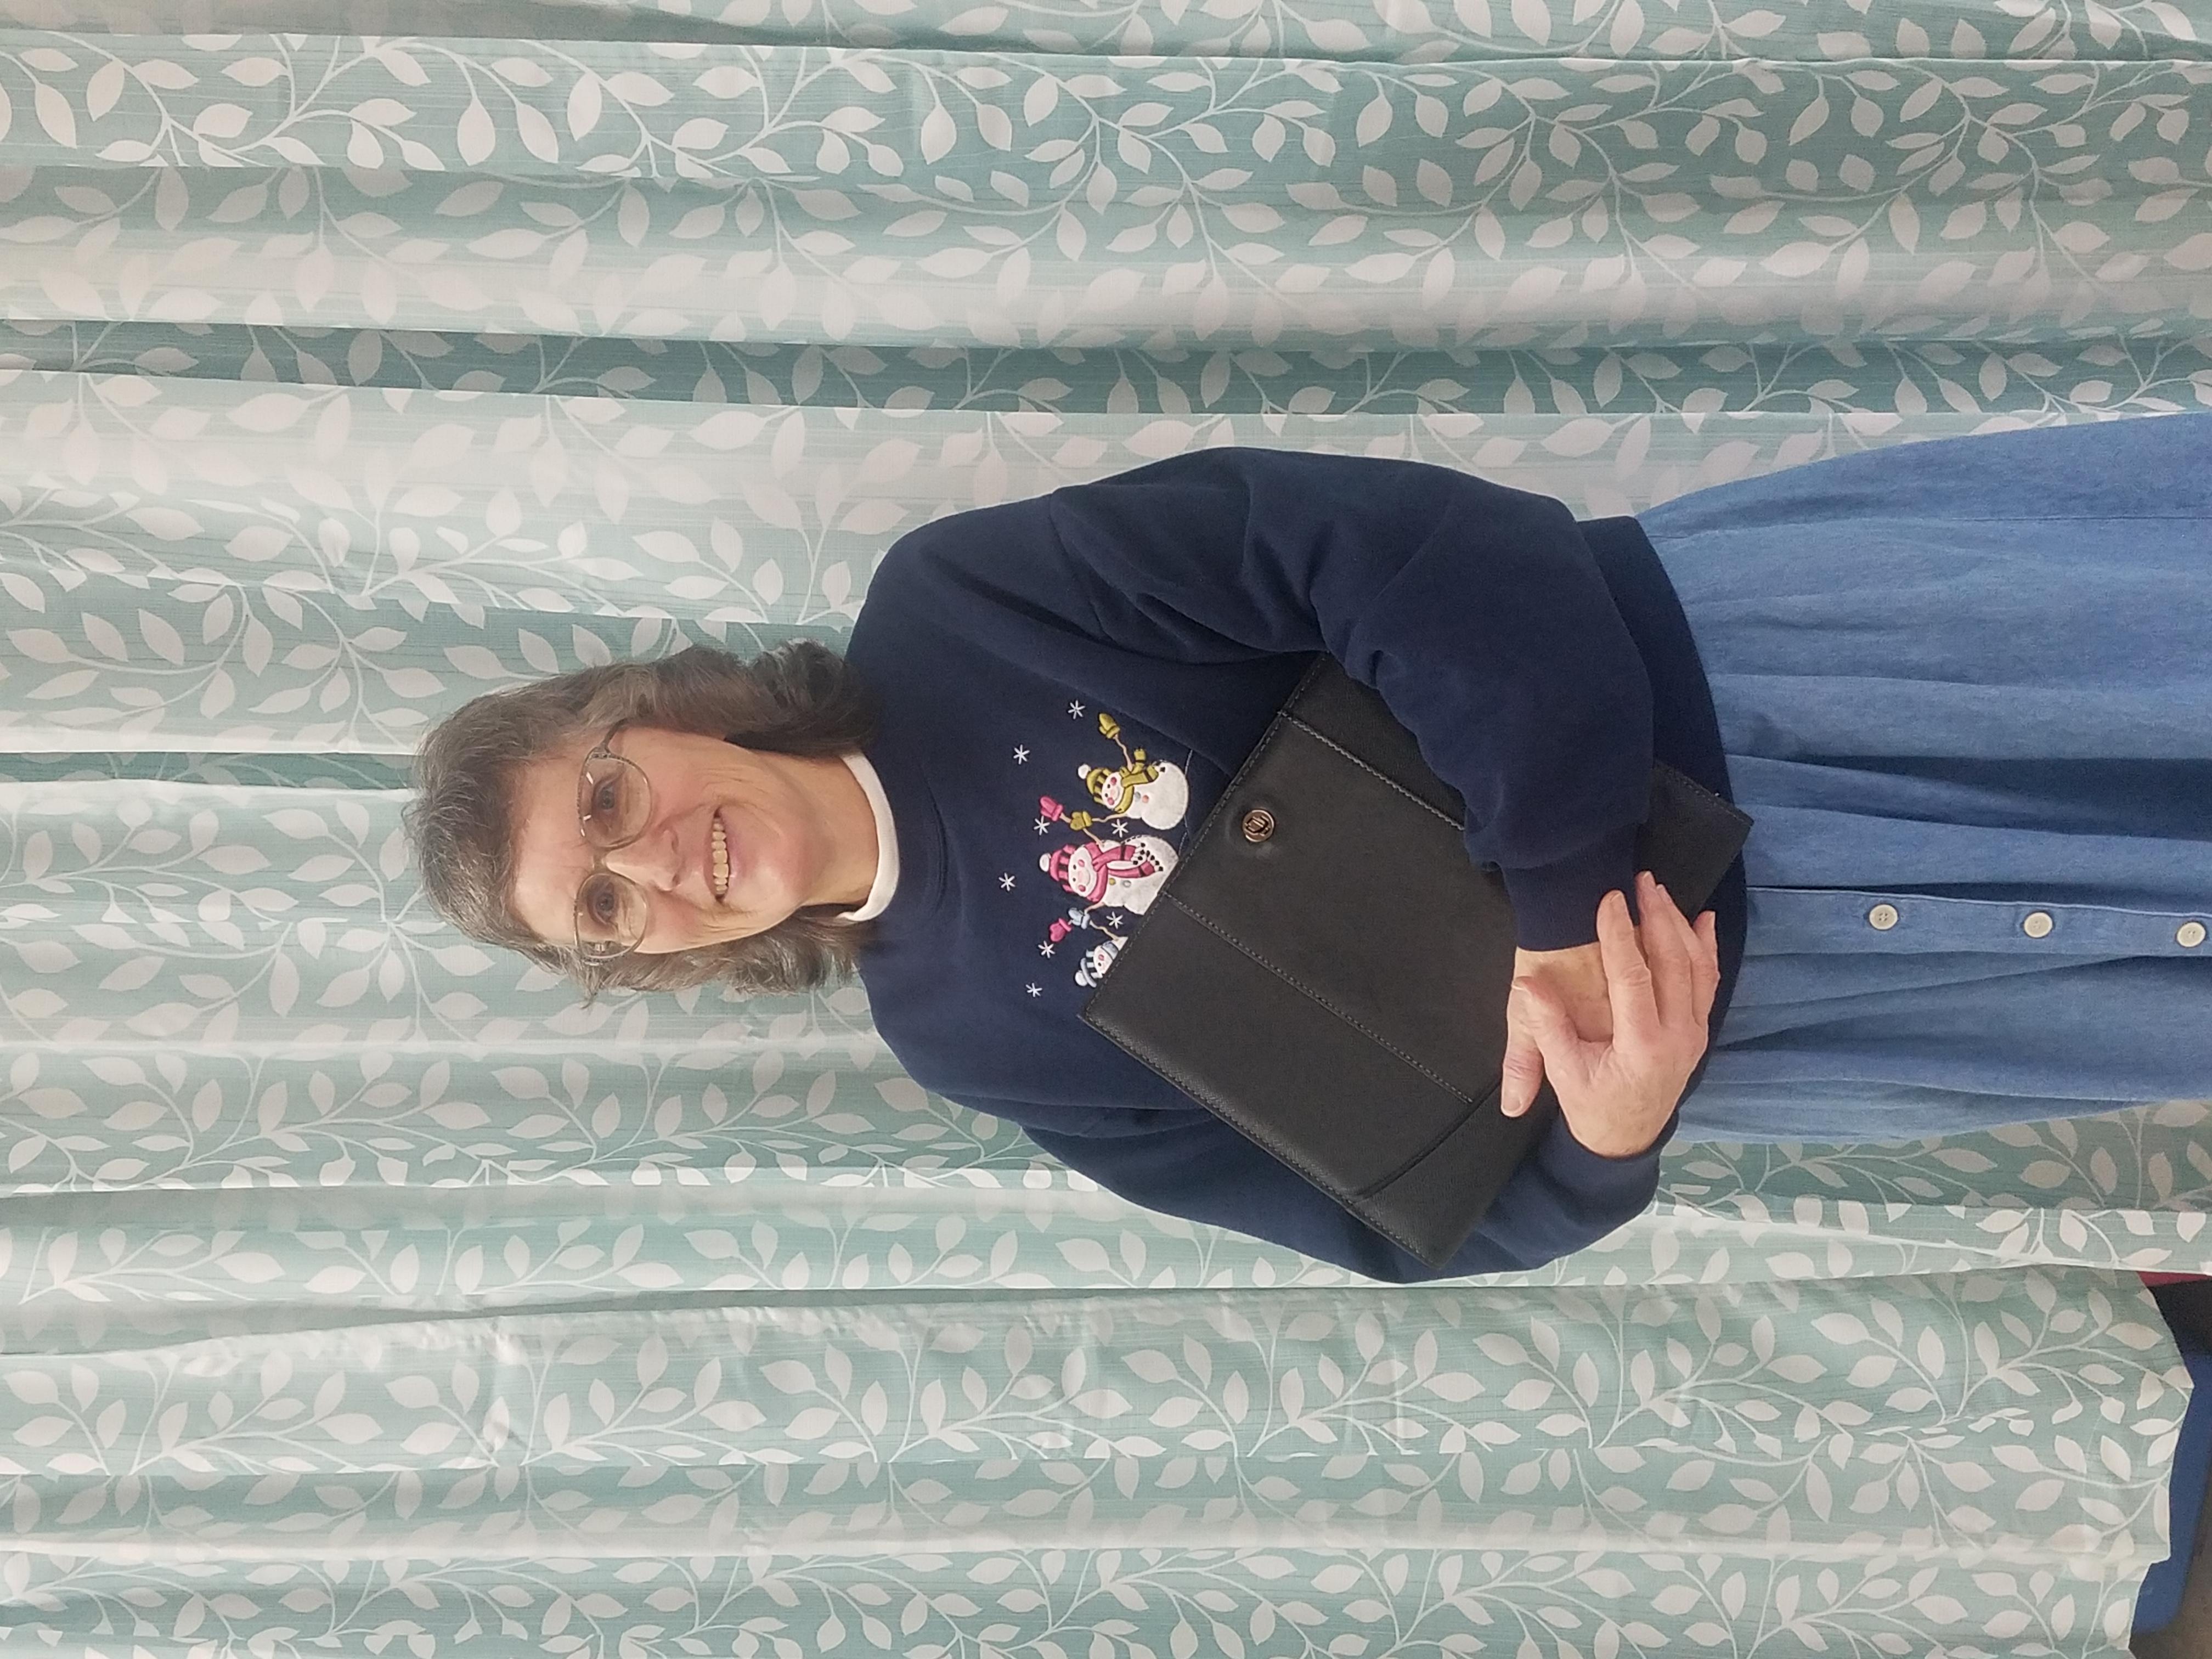 Nadine Ames, Volunteer Supervisor